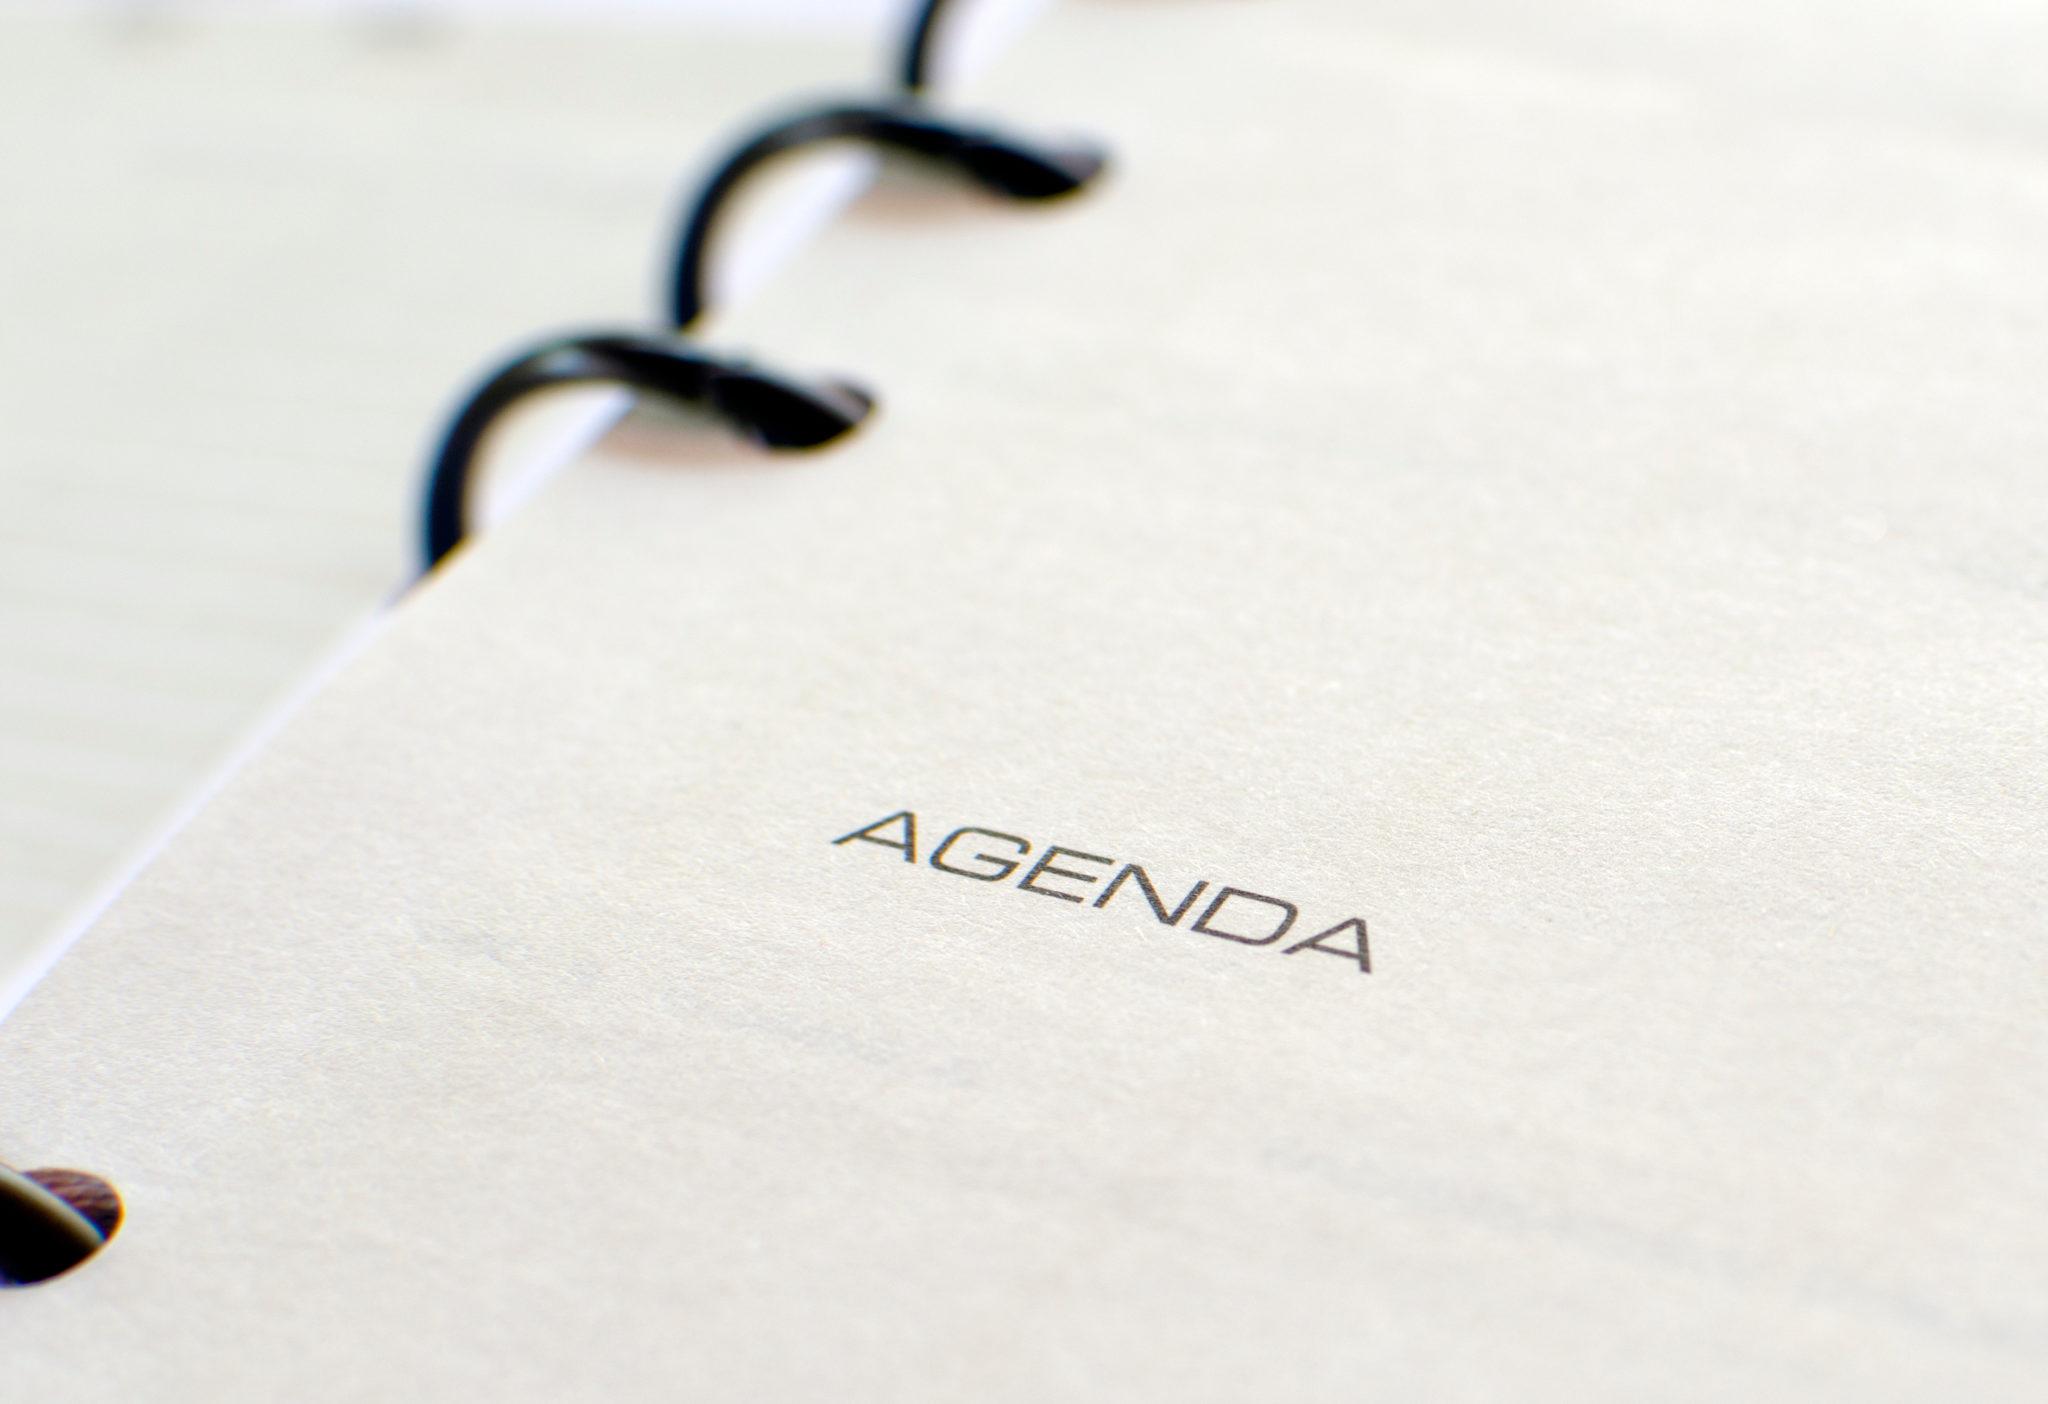 Three Priorities for Board Agendas in 2020